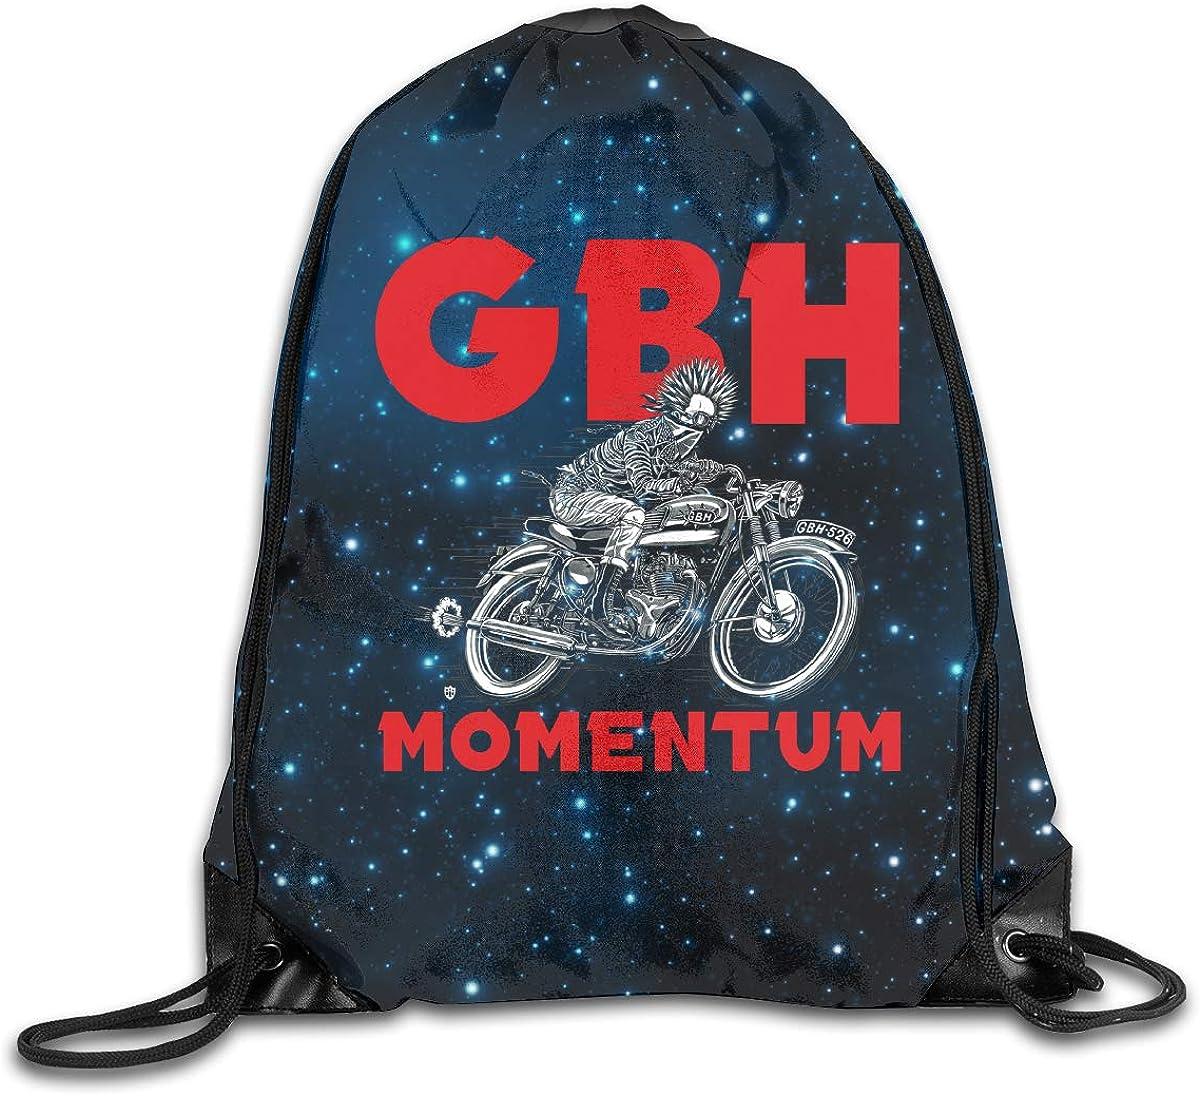 CAOI UUC GBH Momentum Gym Drawstring Backpack Cinch Sack